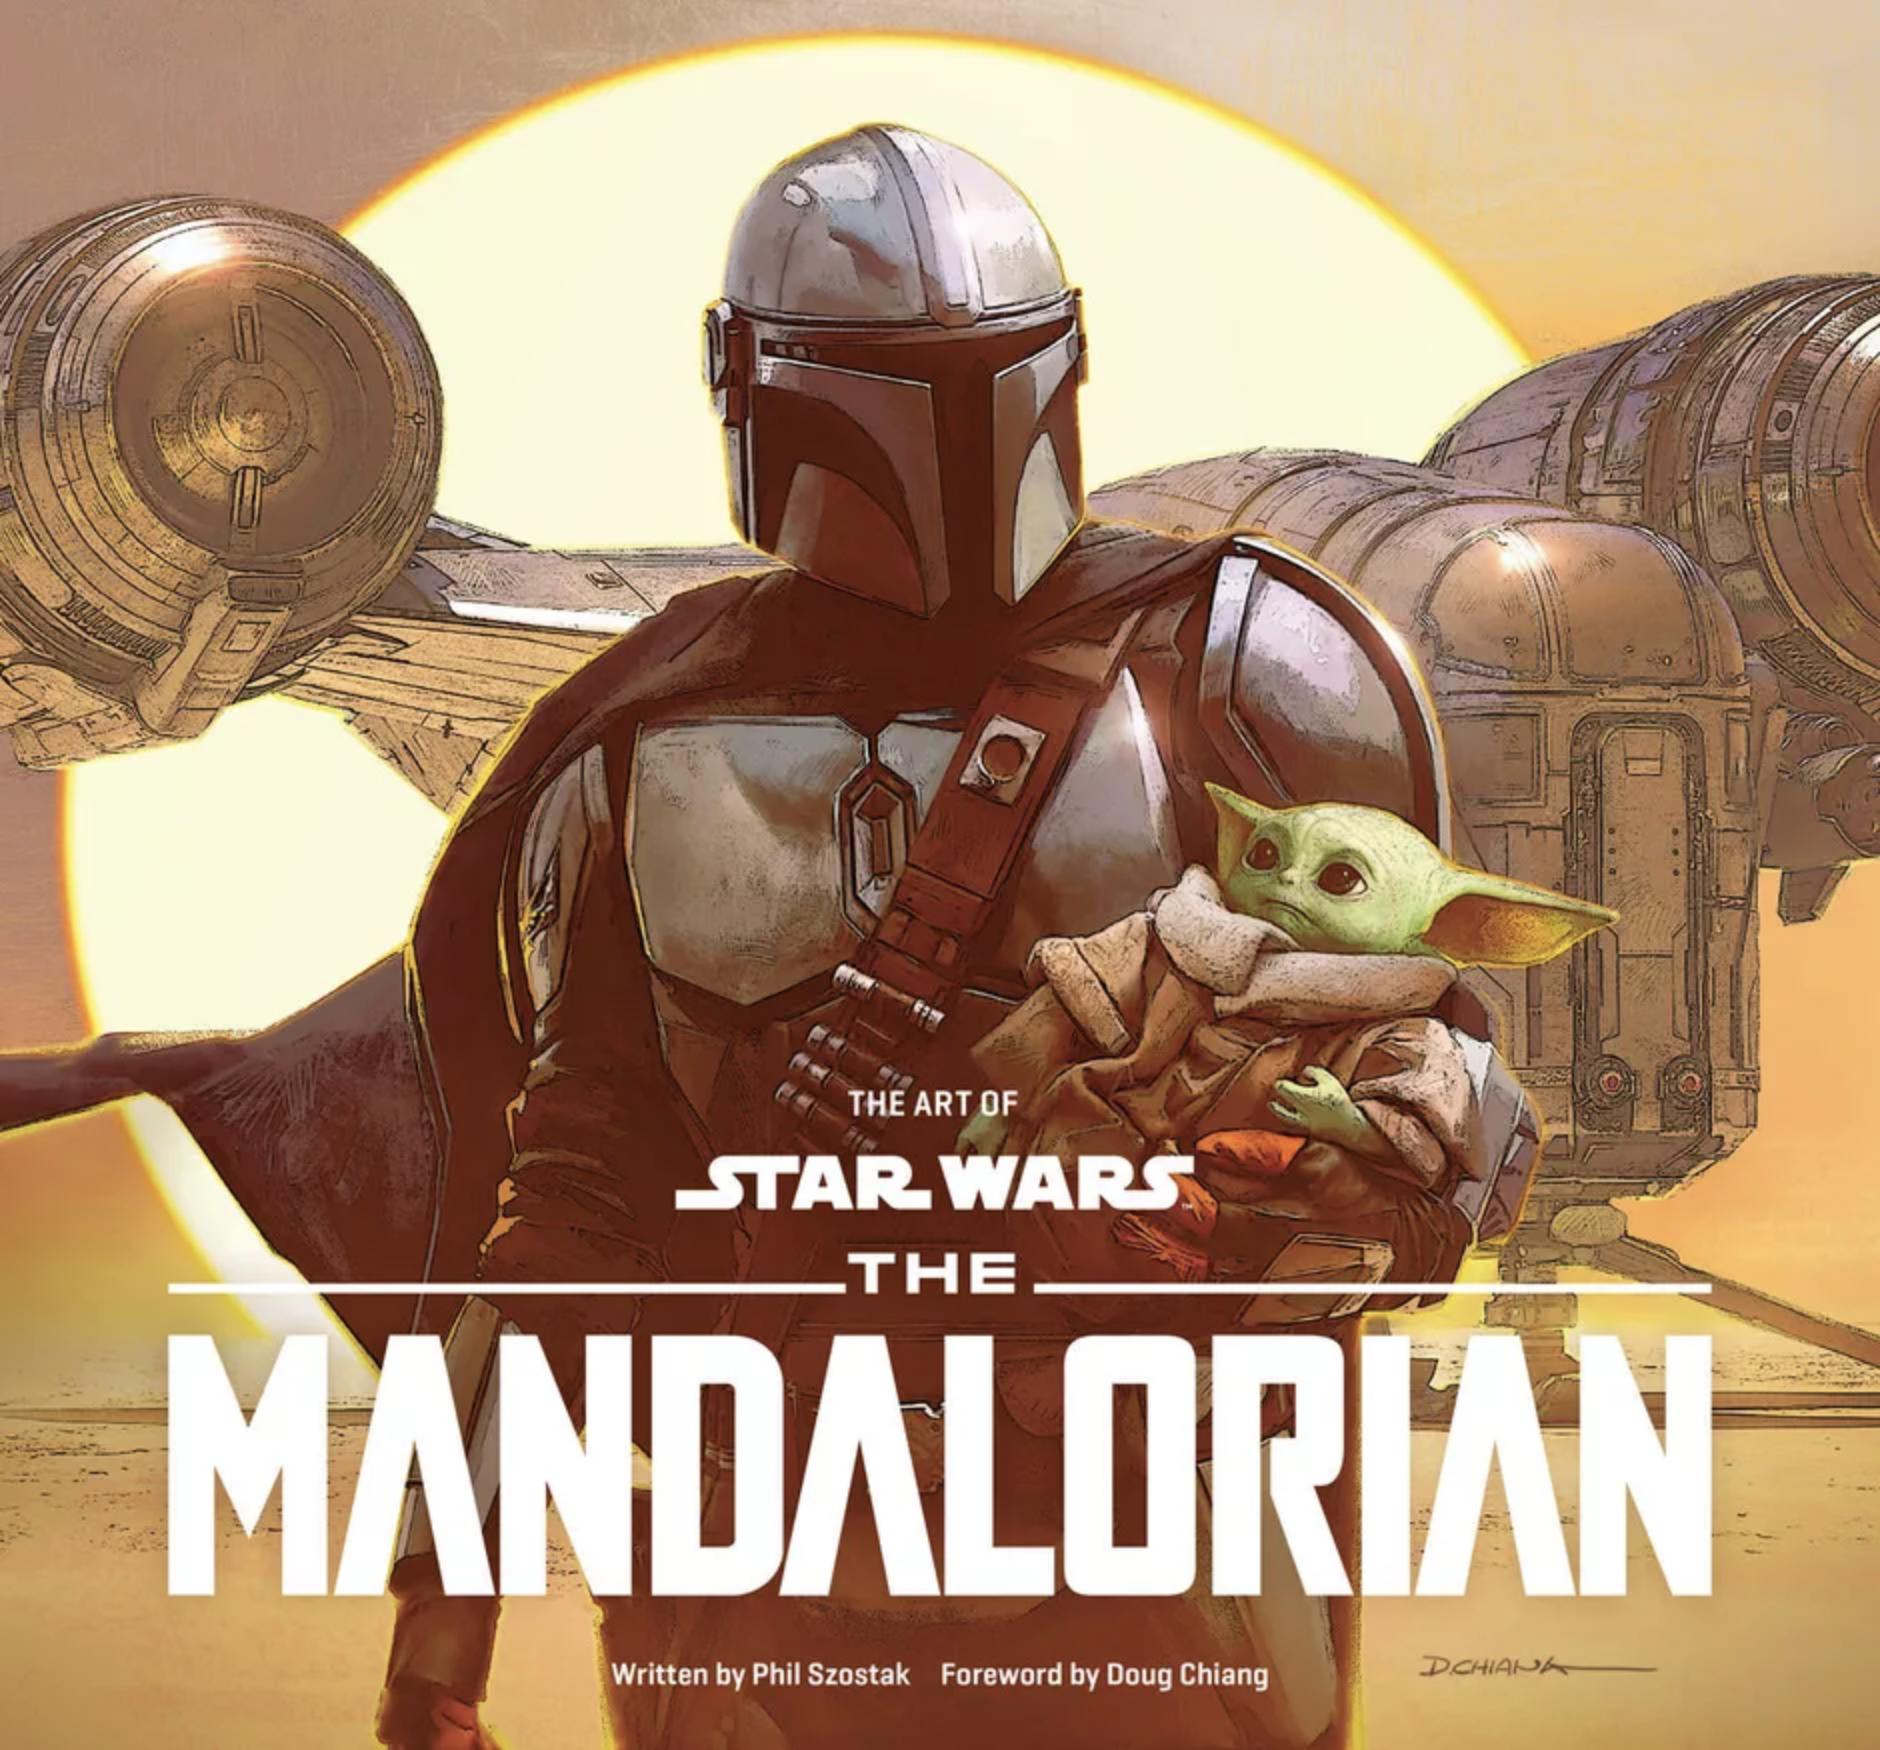 STAR WARS – MANDALORIAN